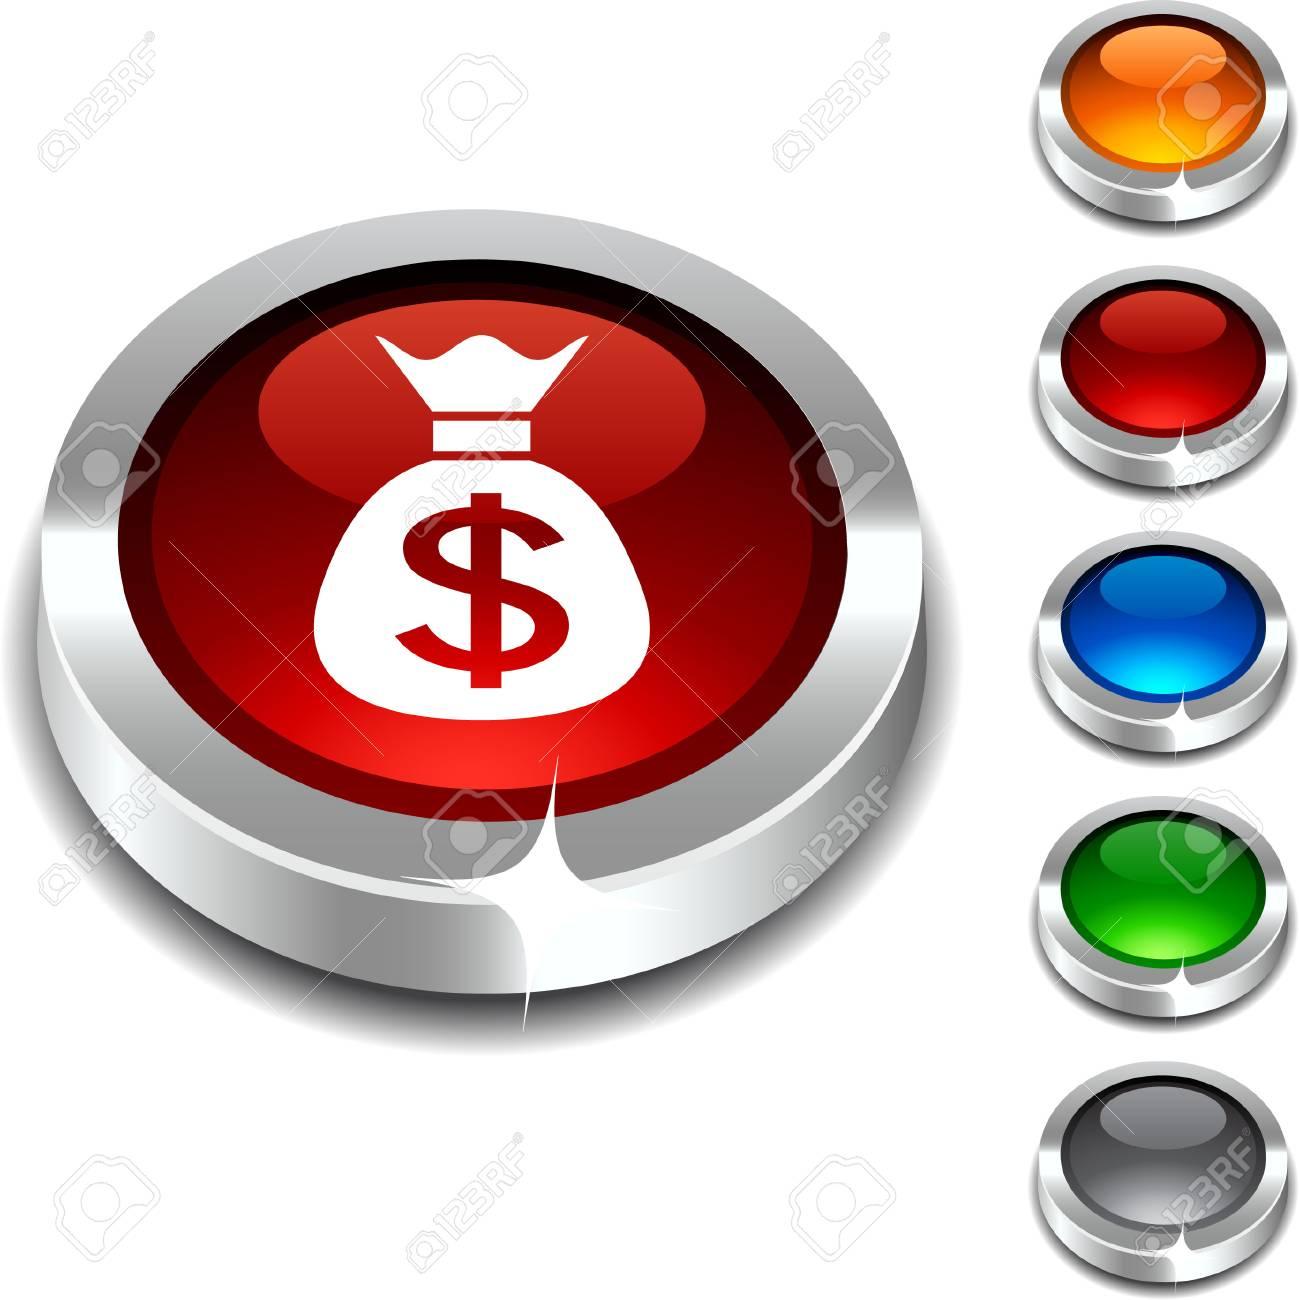 Money 3d button set. illustration. Stock Vector - 5934337